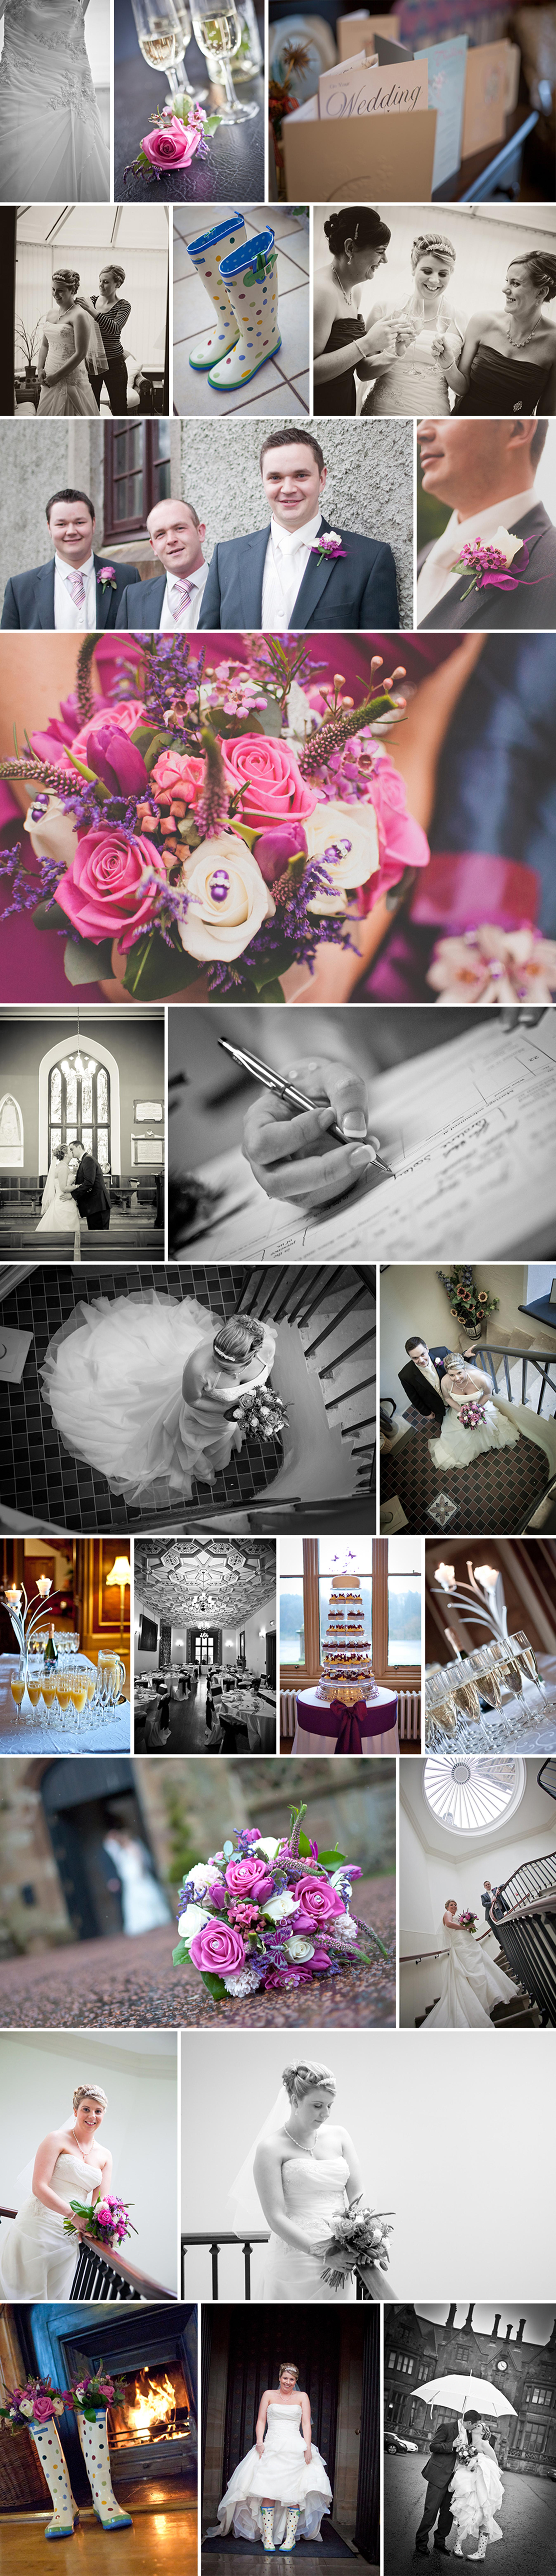 wedding_photography_brownlow_house_lurgan